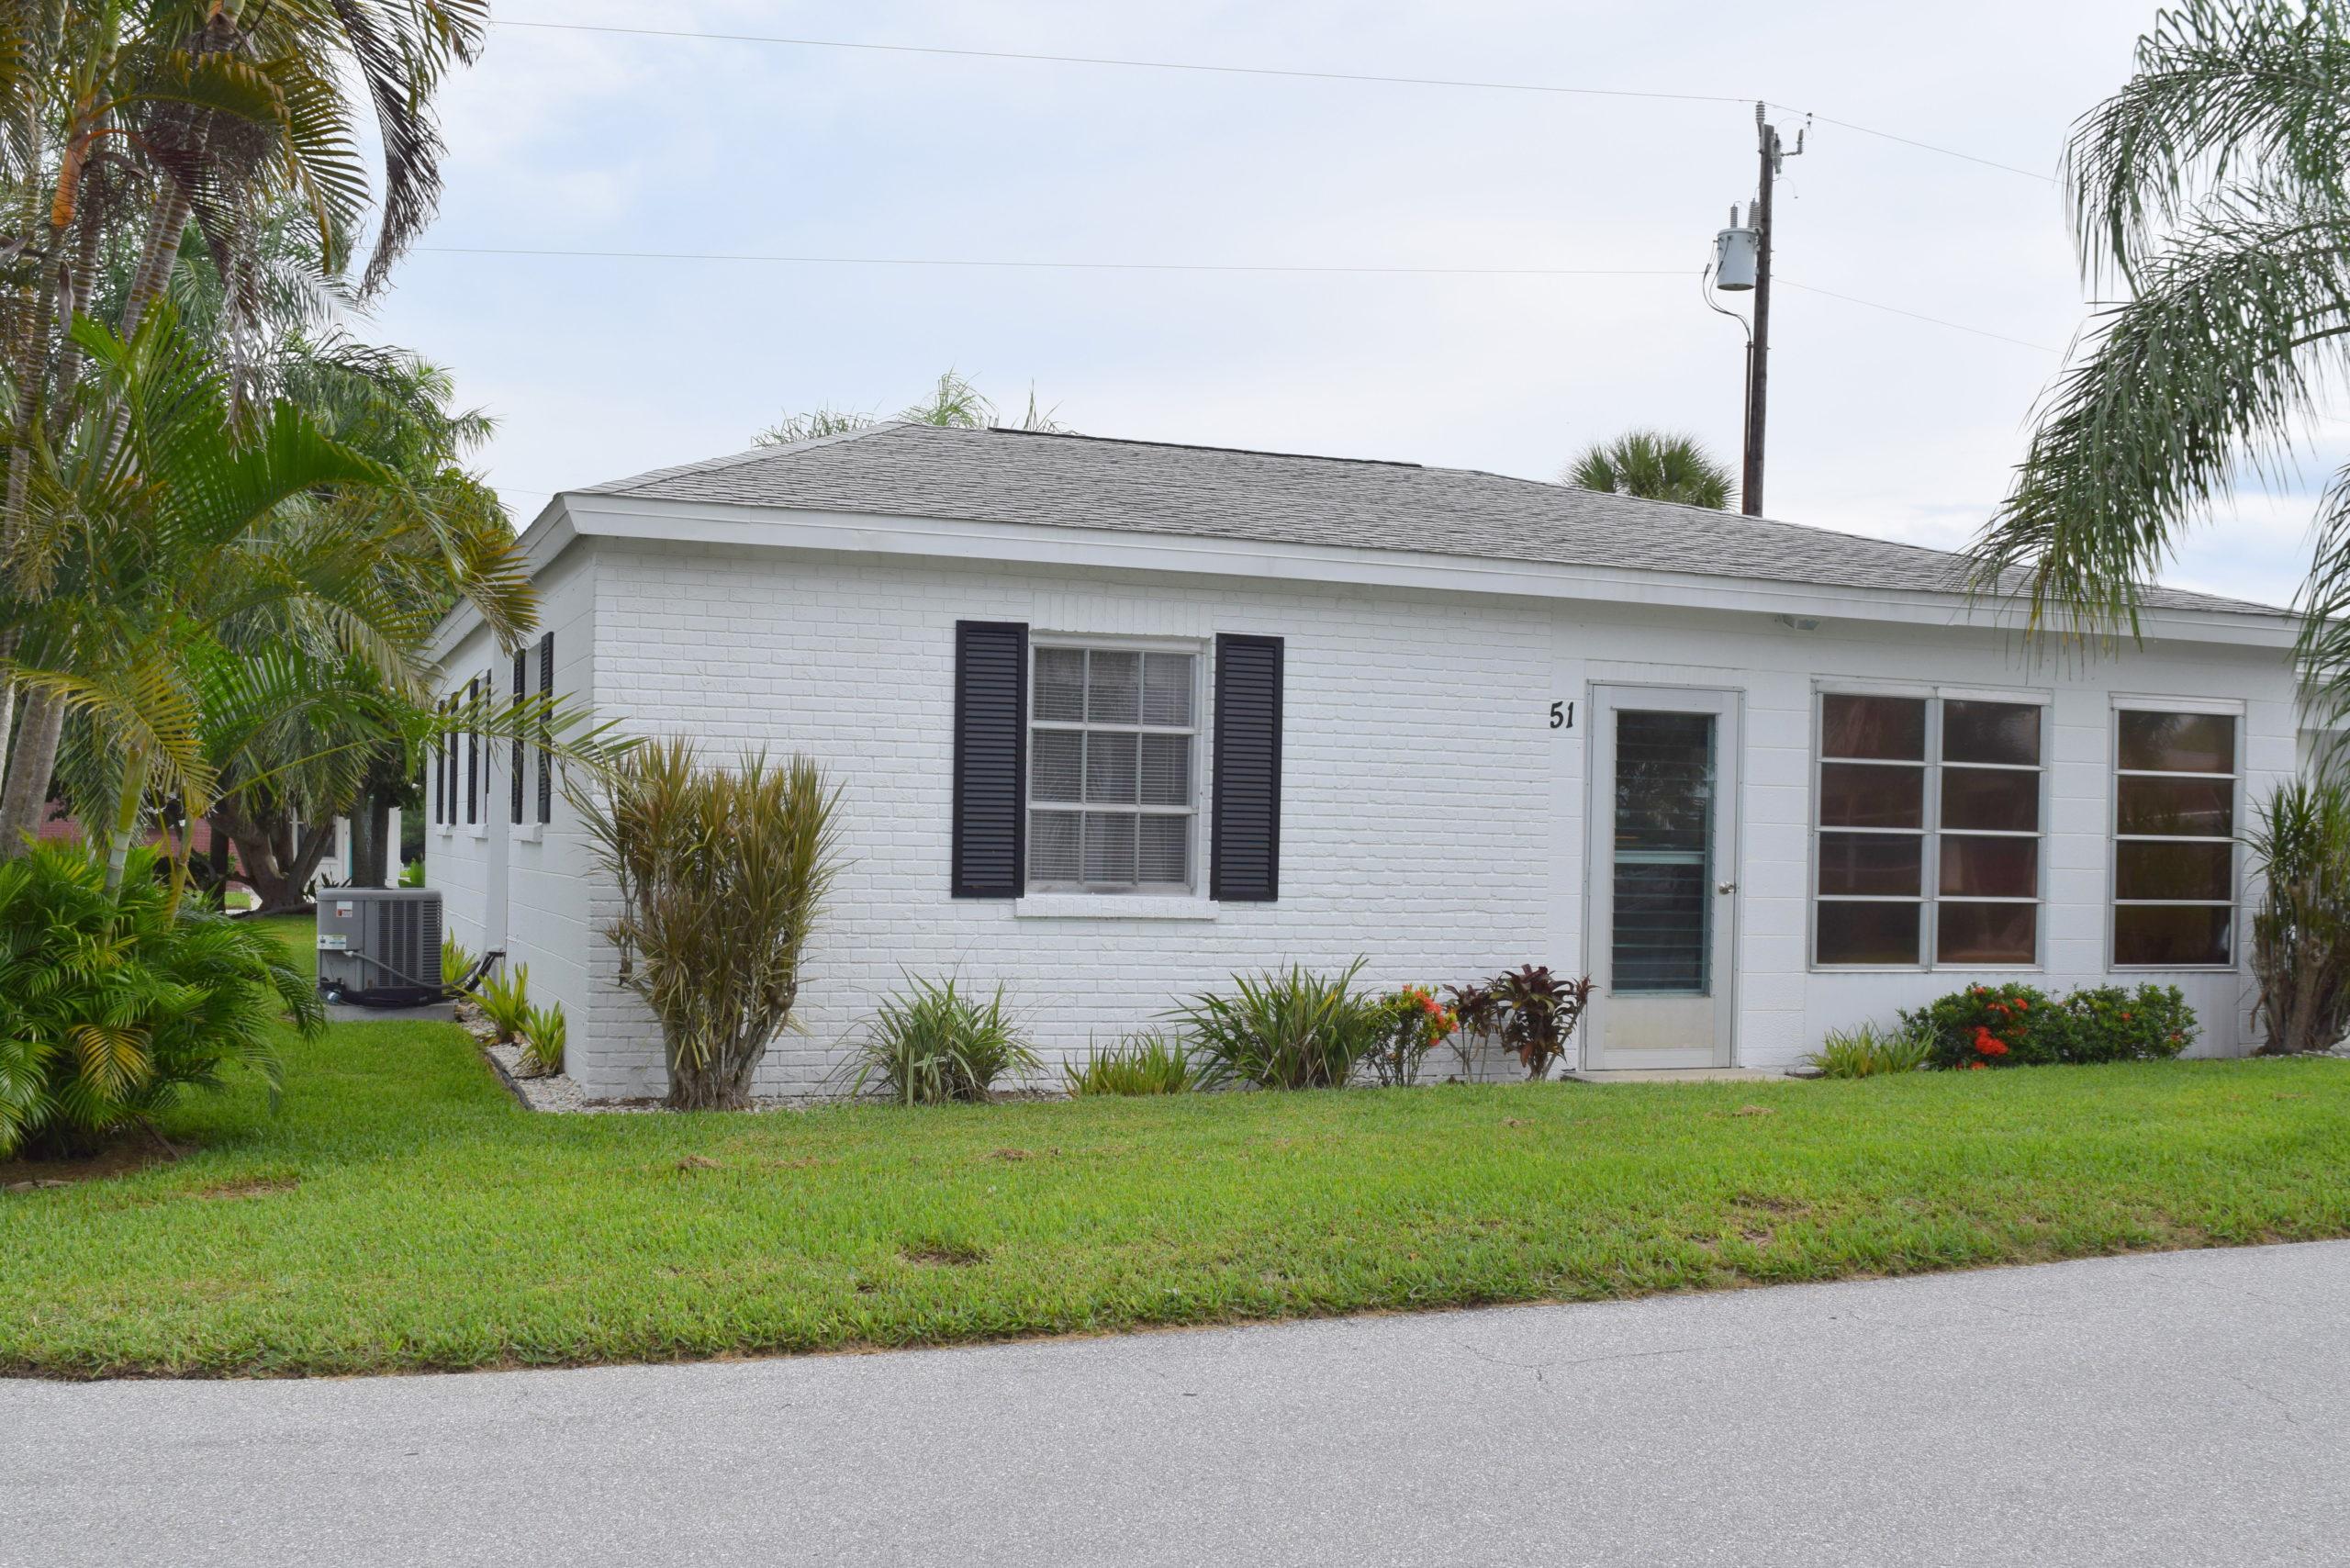 51 Sunrise Dr., Englewood Beach Villas, FL | Florida West ...